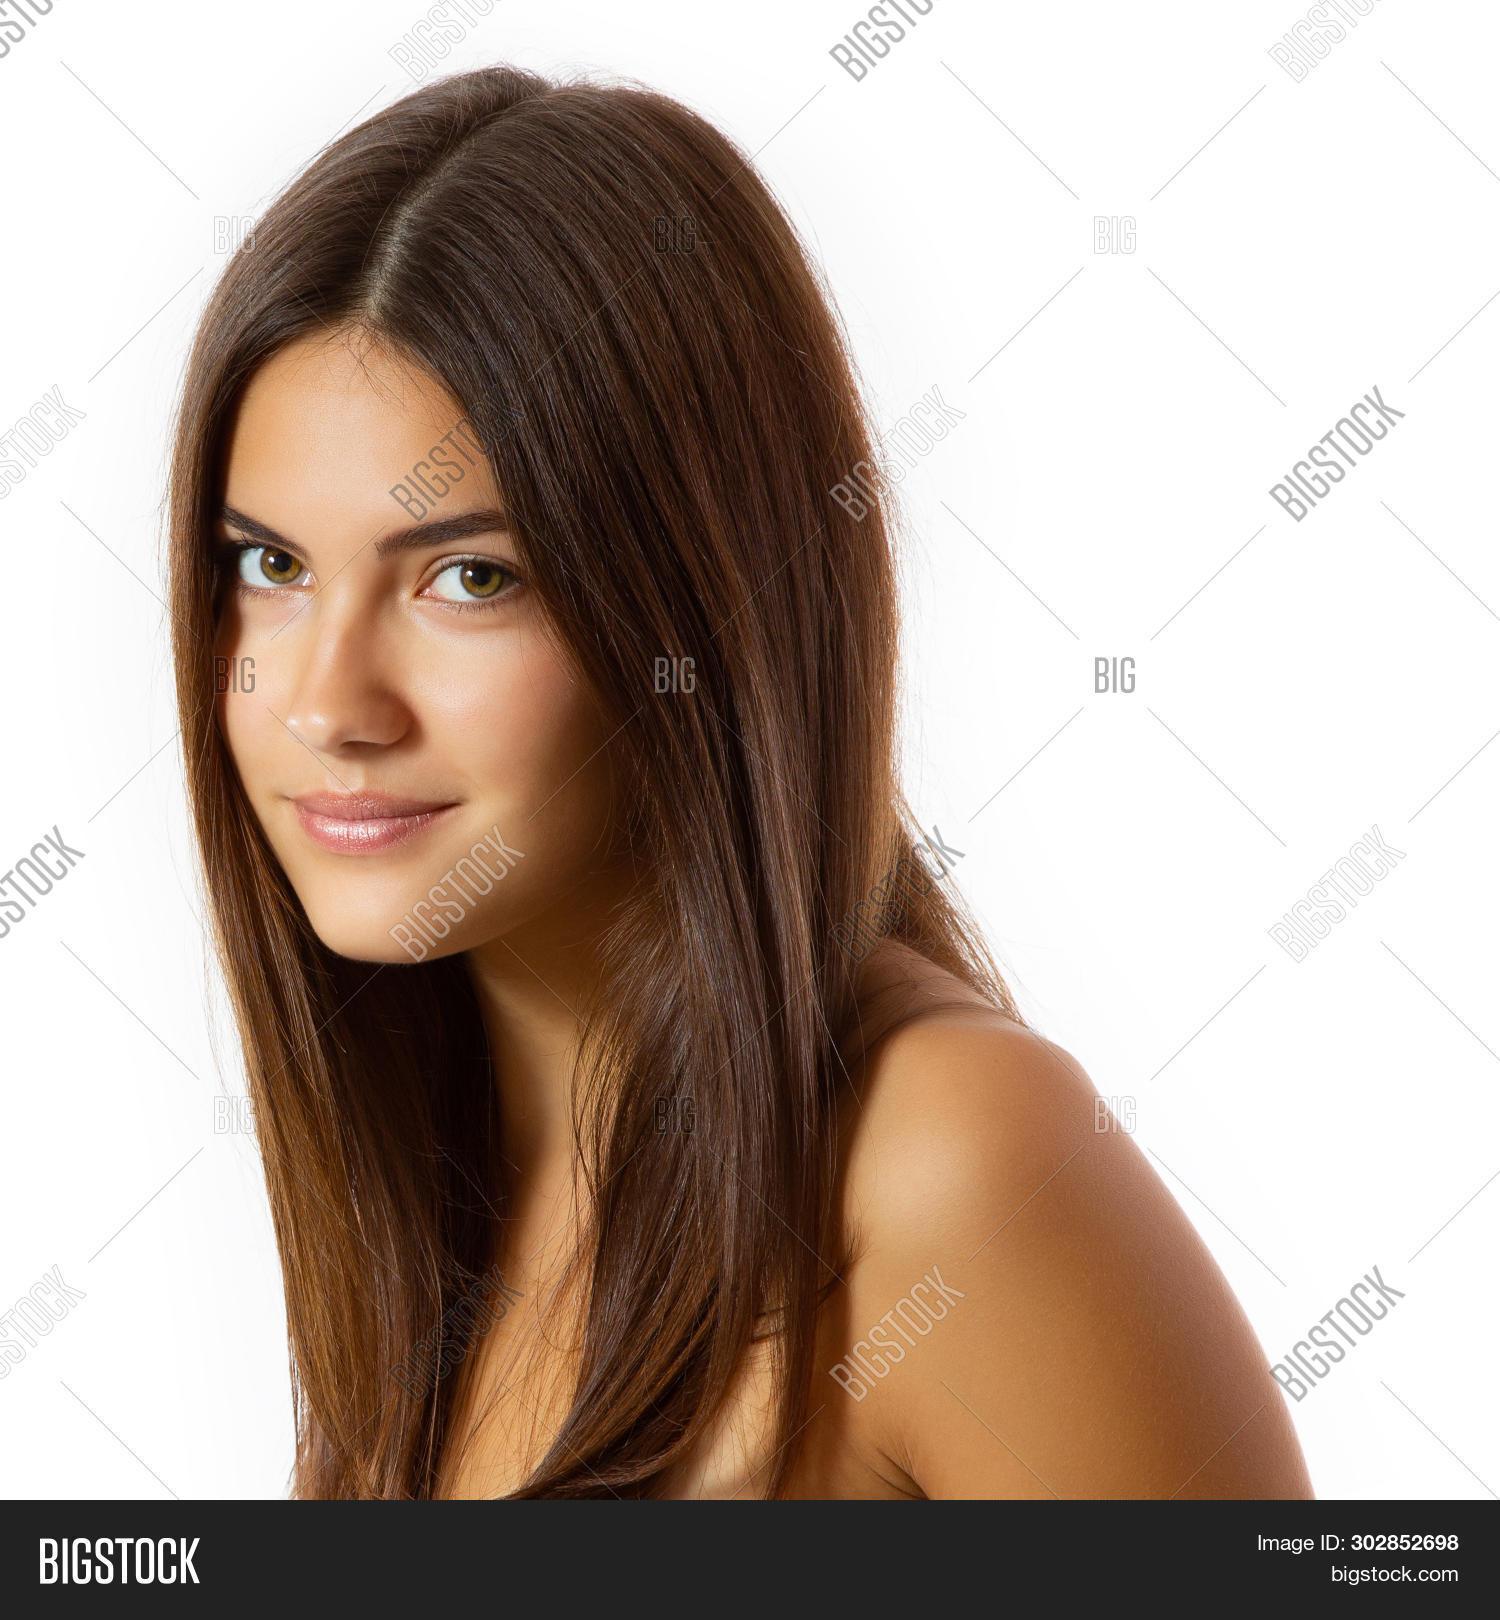 Beauty Feminine Image & Photo (Free Trial) | Bigstock